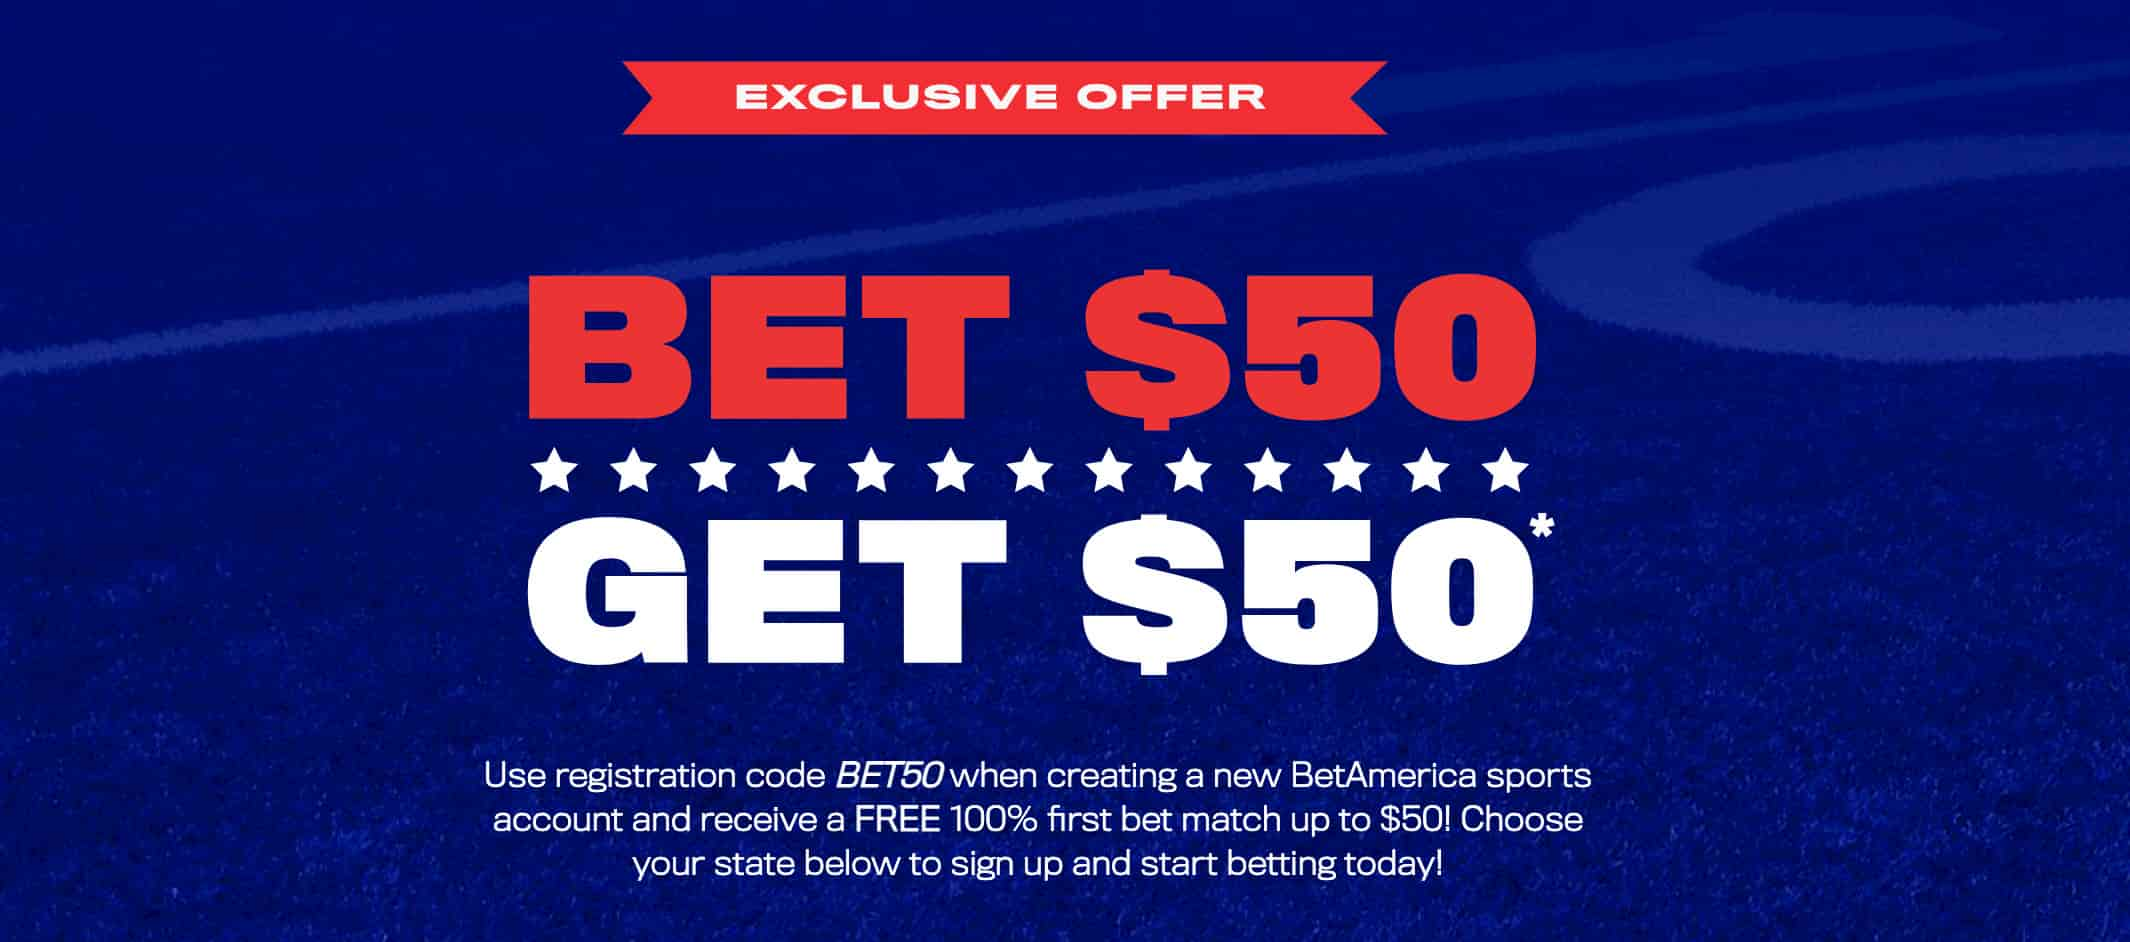 BetAmerica Sign Up Promotion